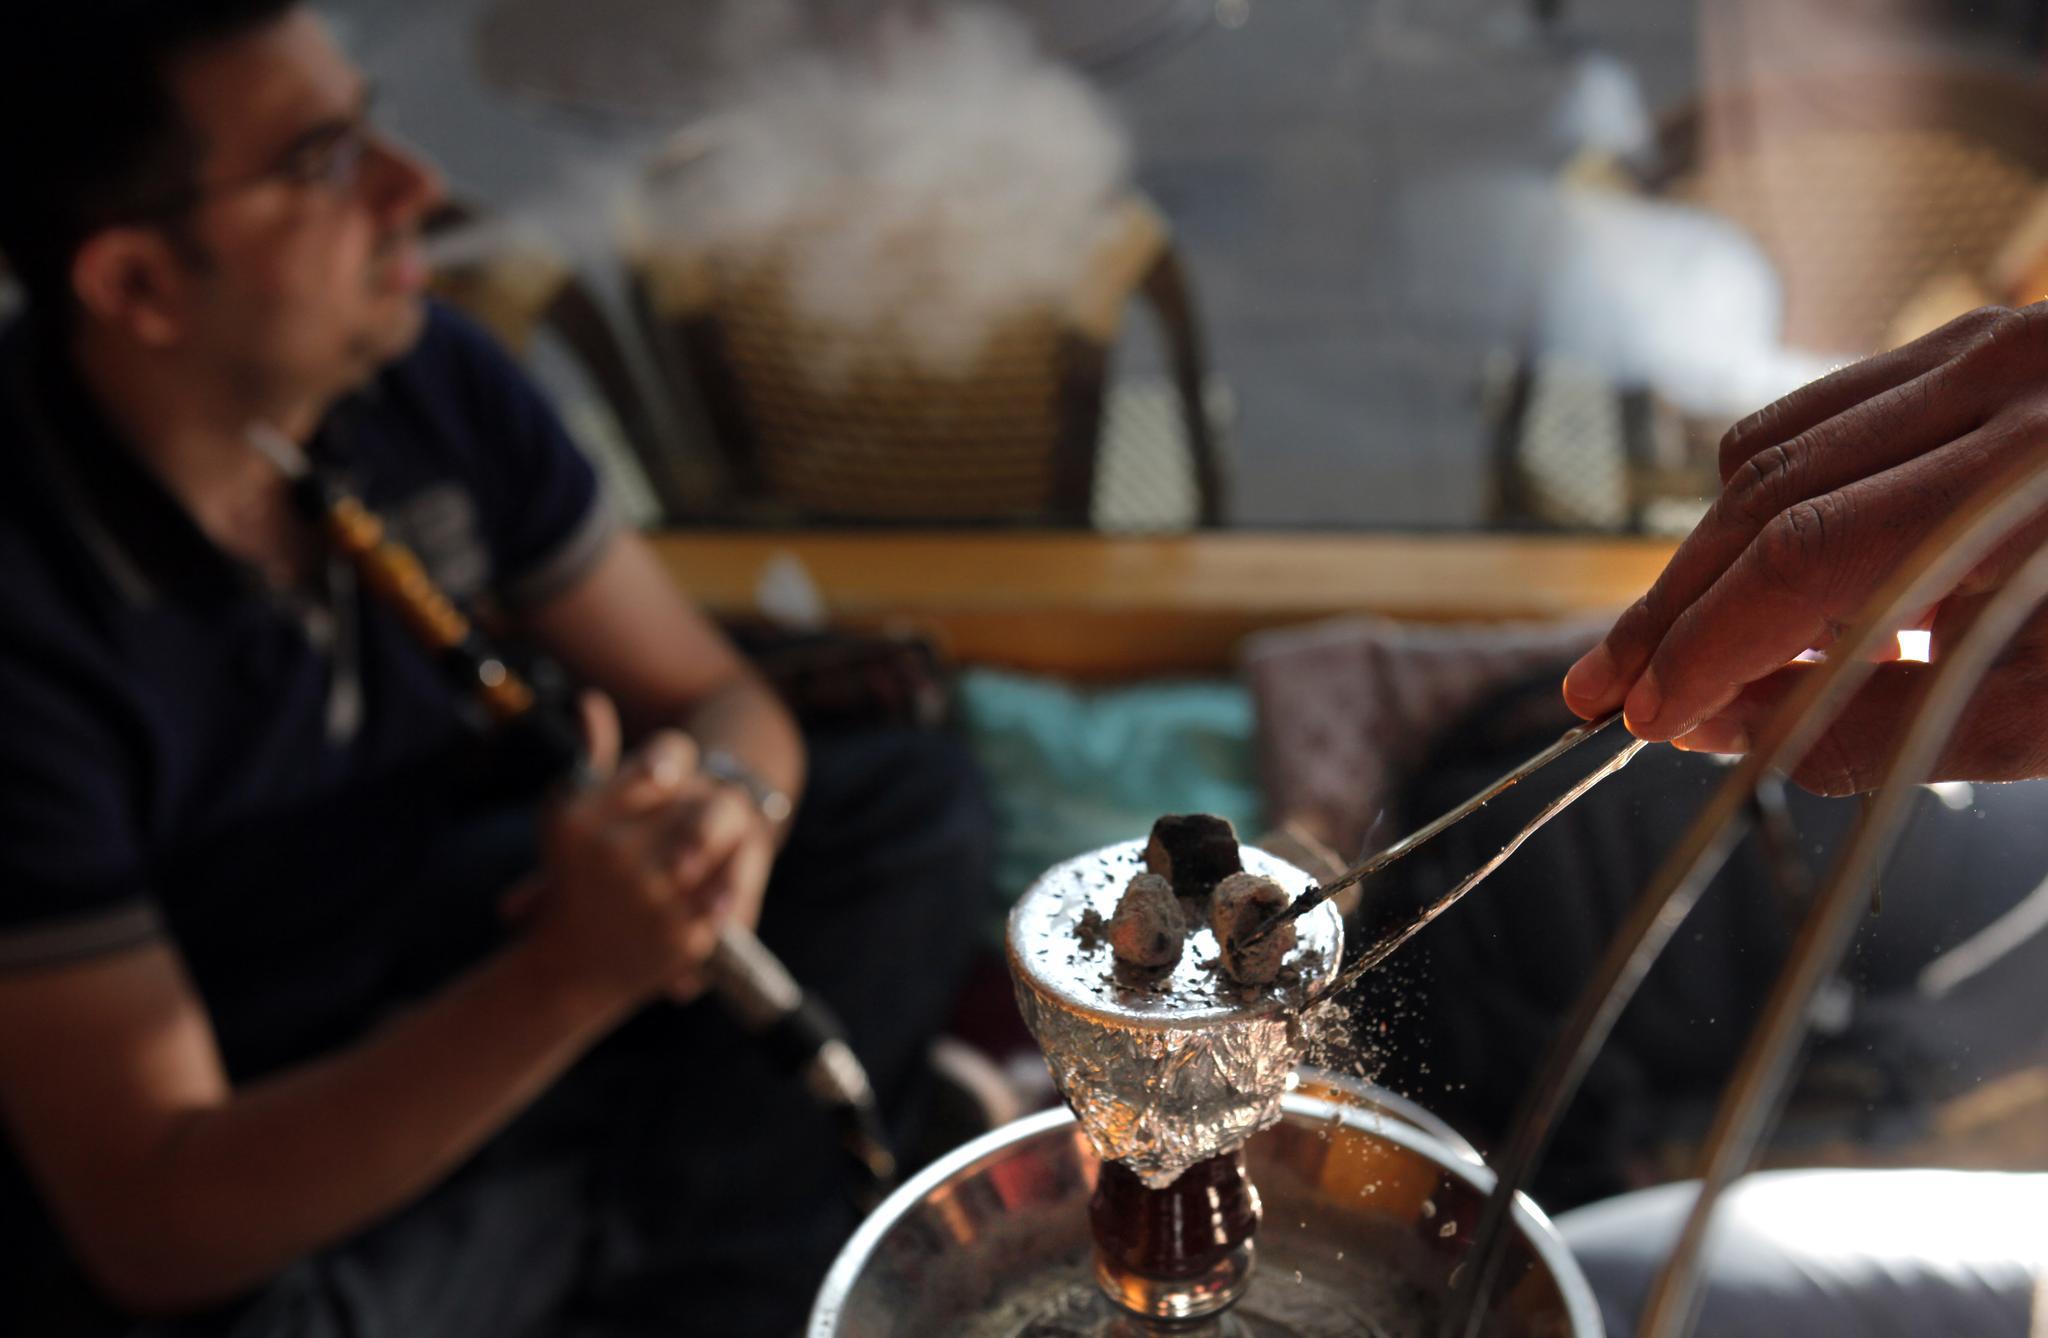 NAGUA: Un joven muere de paro respiratorio tras fumar hookah